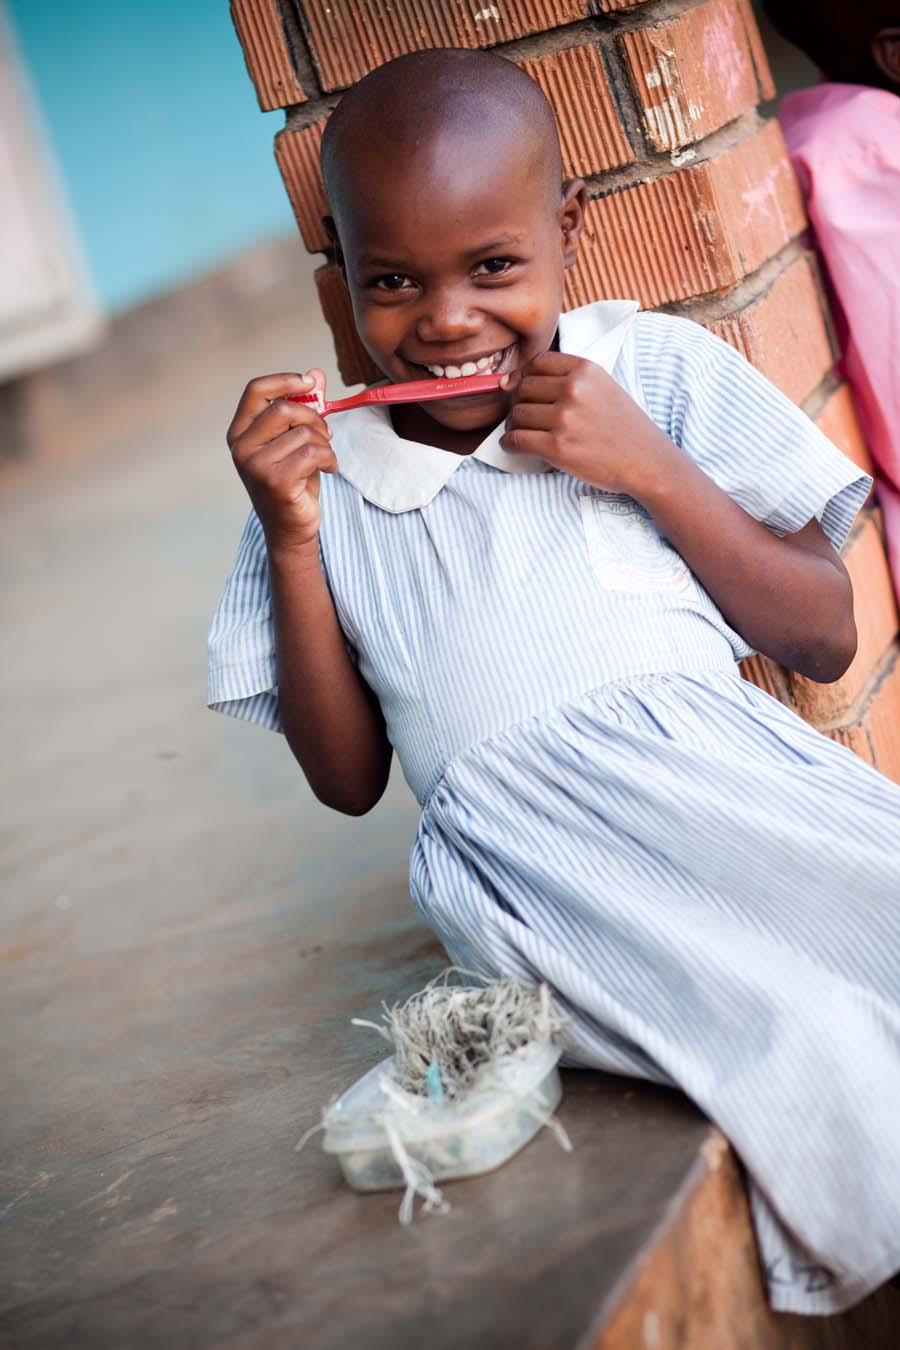 jessicadavisphotography.com | Jessica Davis Photography | Portrait Work in Uganda| Travel Photographer | World Event Photographs 0 (3).jpg